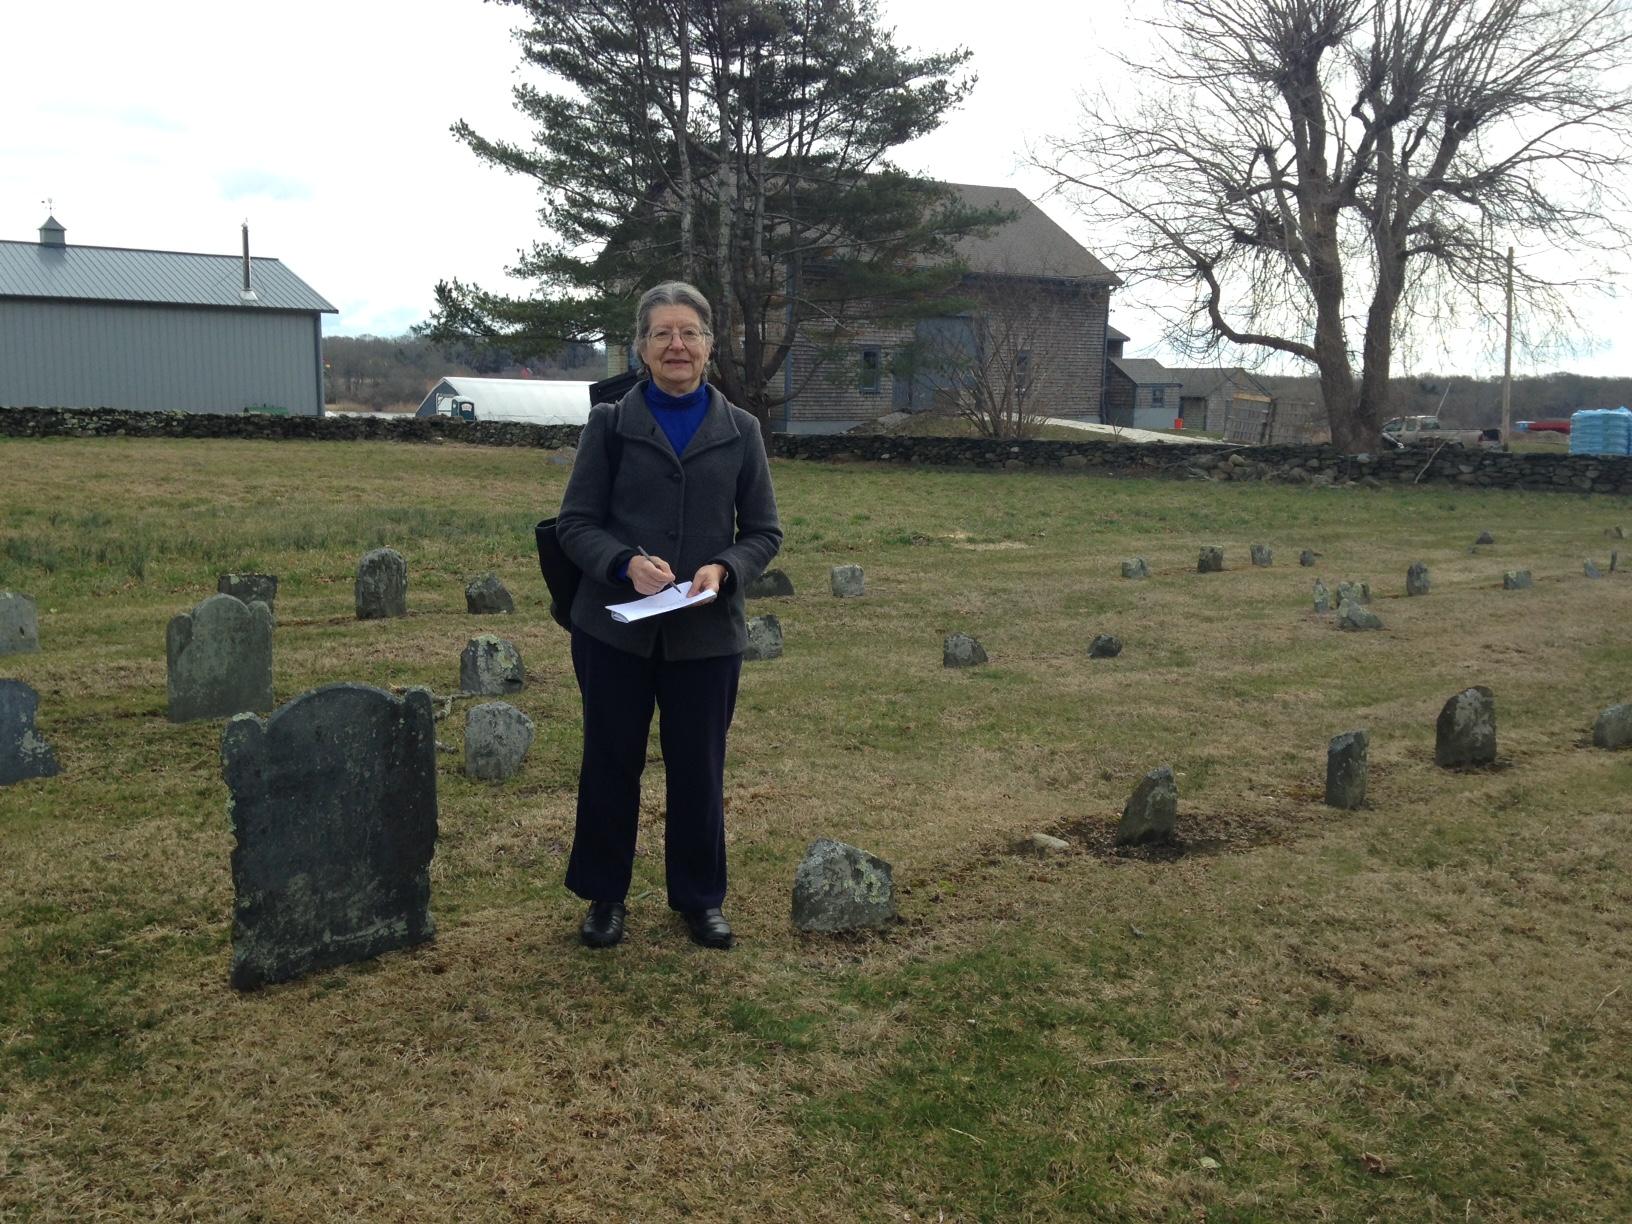 Elizabeth Cazden Quaker Historian visits the LC Quaker Burying Ground